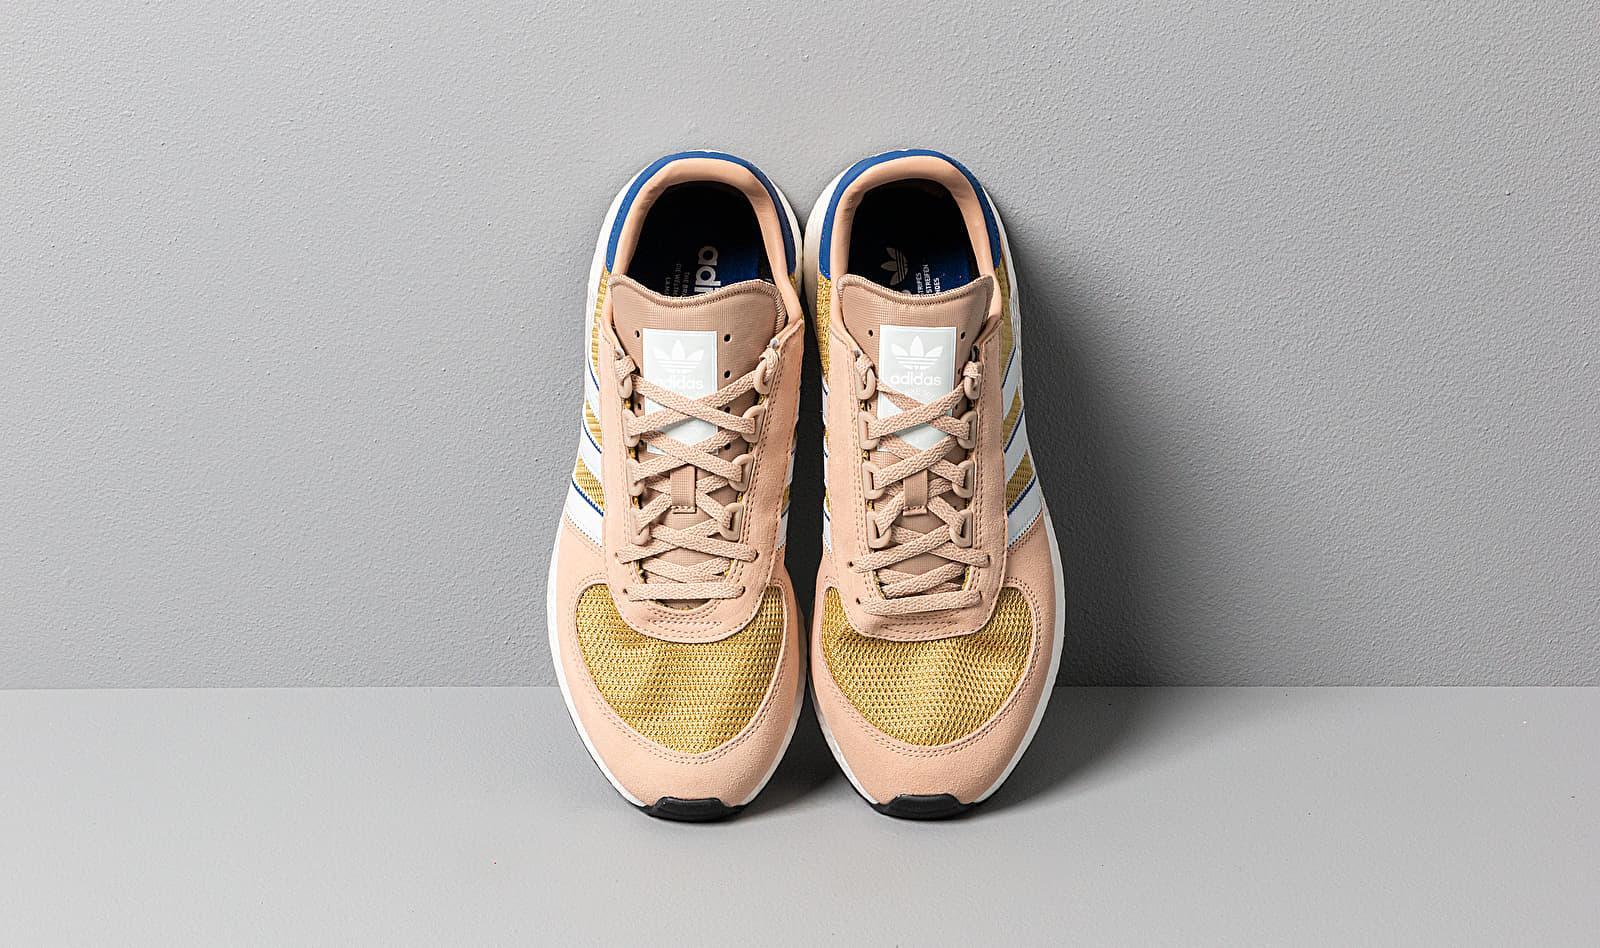 Adidas Marathon Tech St Pale Nude/ Blue Tint/ Core Royal adidas Originals de color Marrón